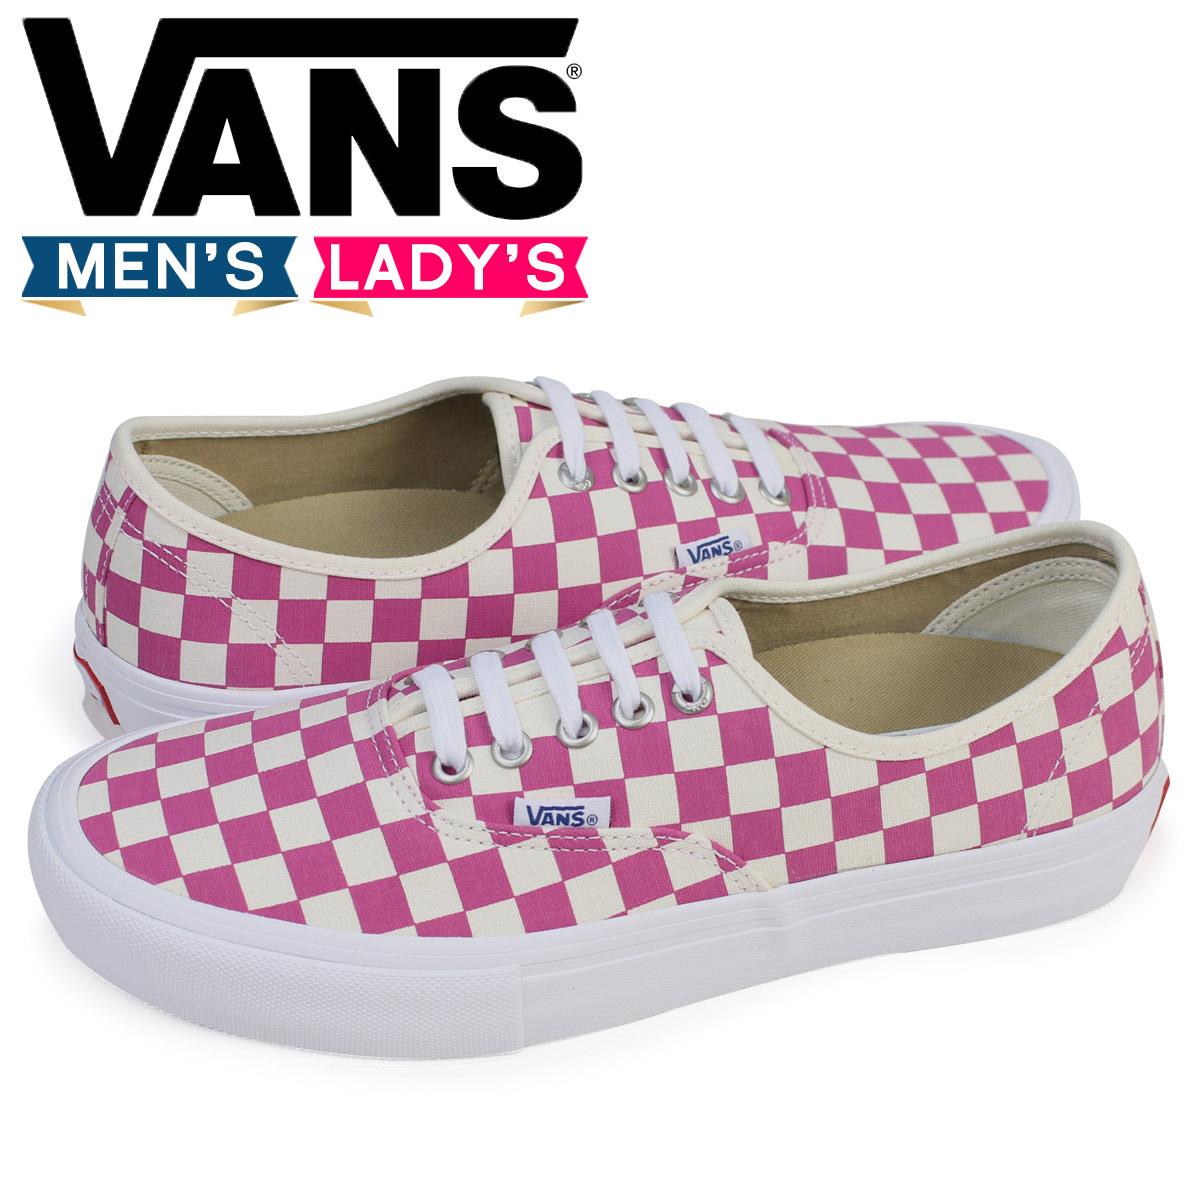 c1e585742c341b VANS authentic sneakers men gap Dis vans station wagons AUTHENTIC PRO  VN0A3479OM2 shoes pink  8 1 Shinnyu load